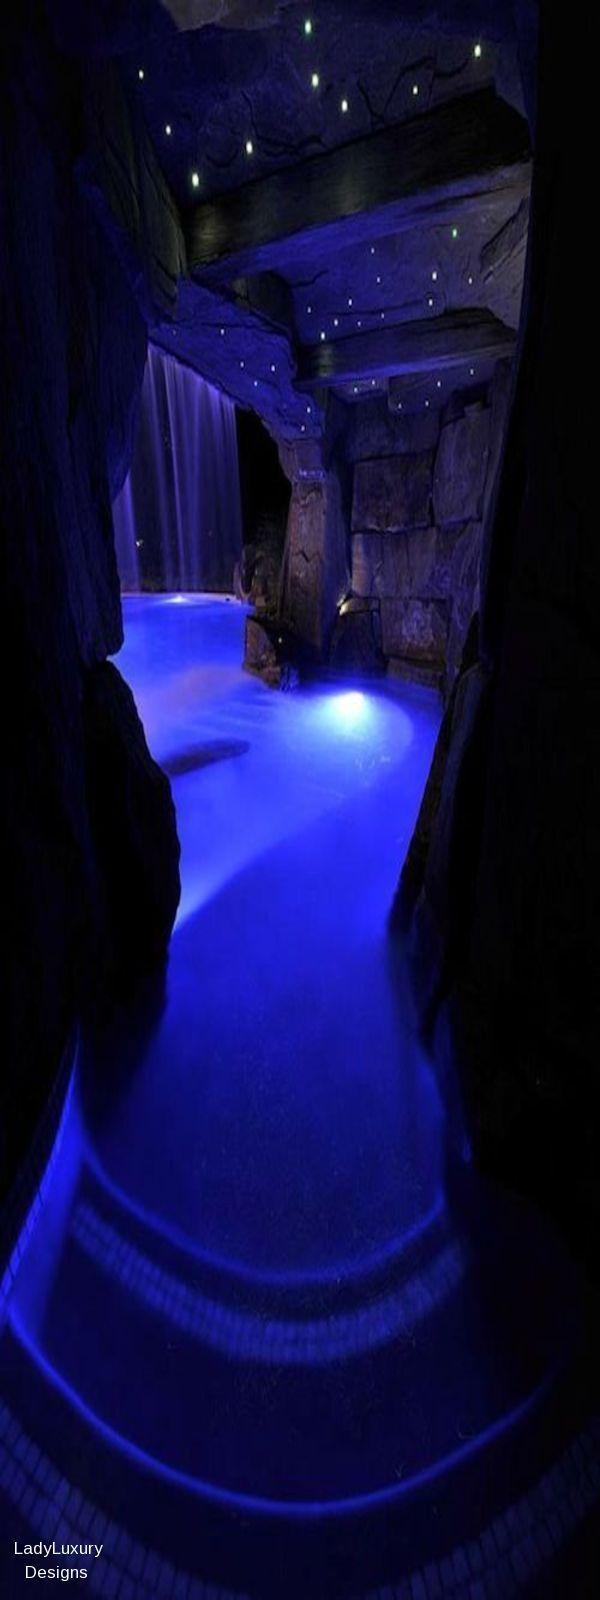 Million Dollar Interiors- Indoor Pool | LadyLuxuryDesigns - http://www.homedecoz.com/home-decor/million-dollar-interiors-indoor-pool-ladyluxurydesigns/